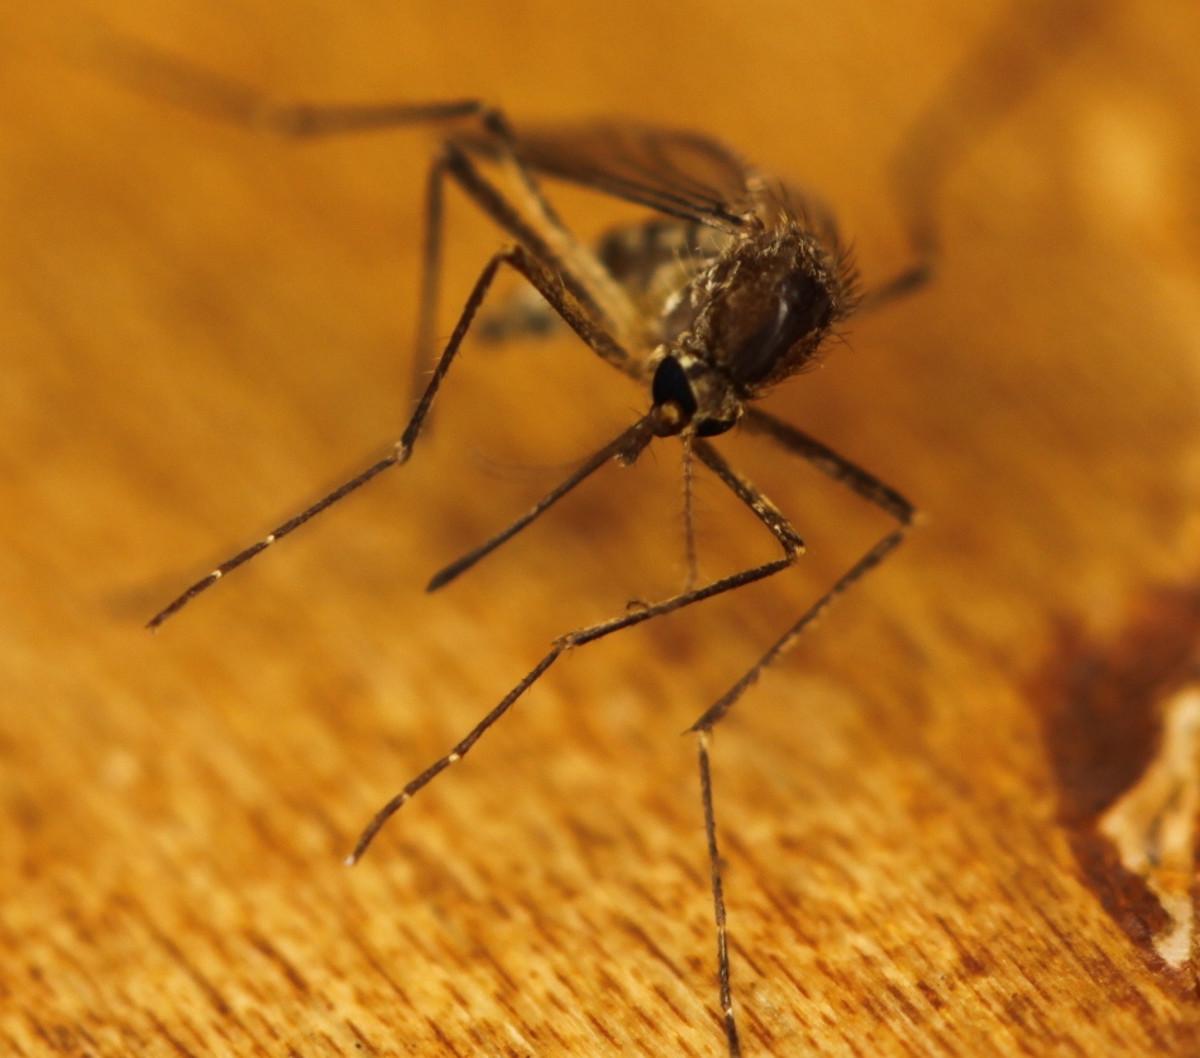 Best Mosquito Repellent and Anti Mosquito Tricks